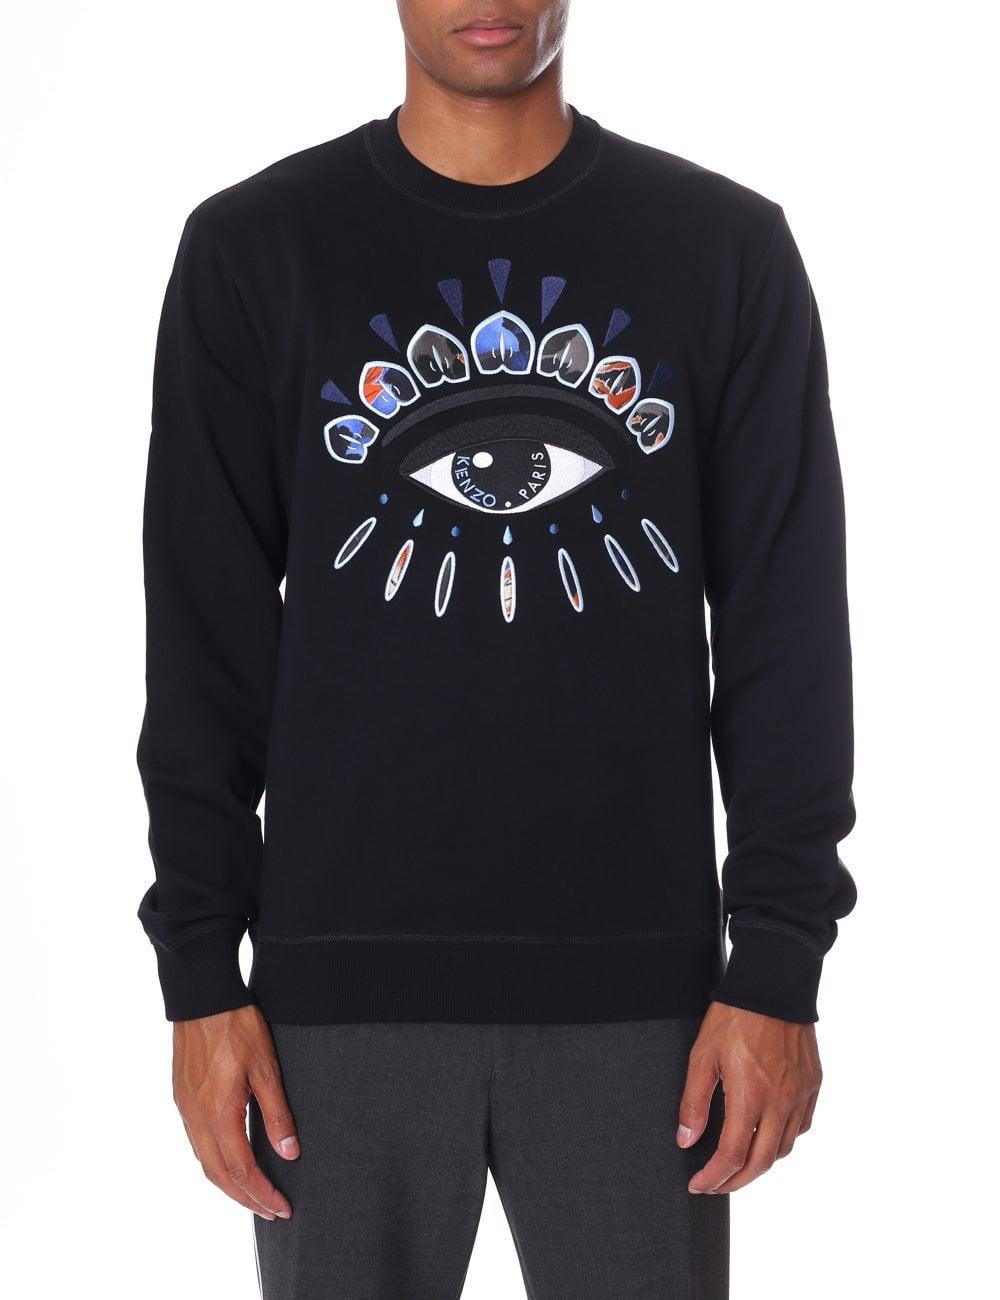 623741061f Kenzo Men's Indonesian Flow Eye Sweatshirt